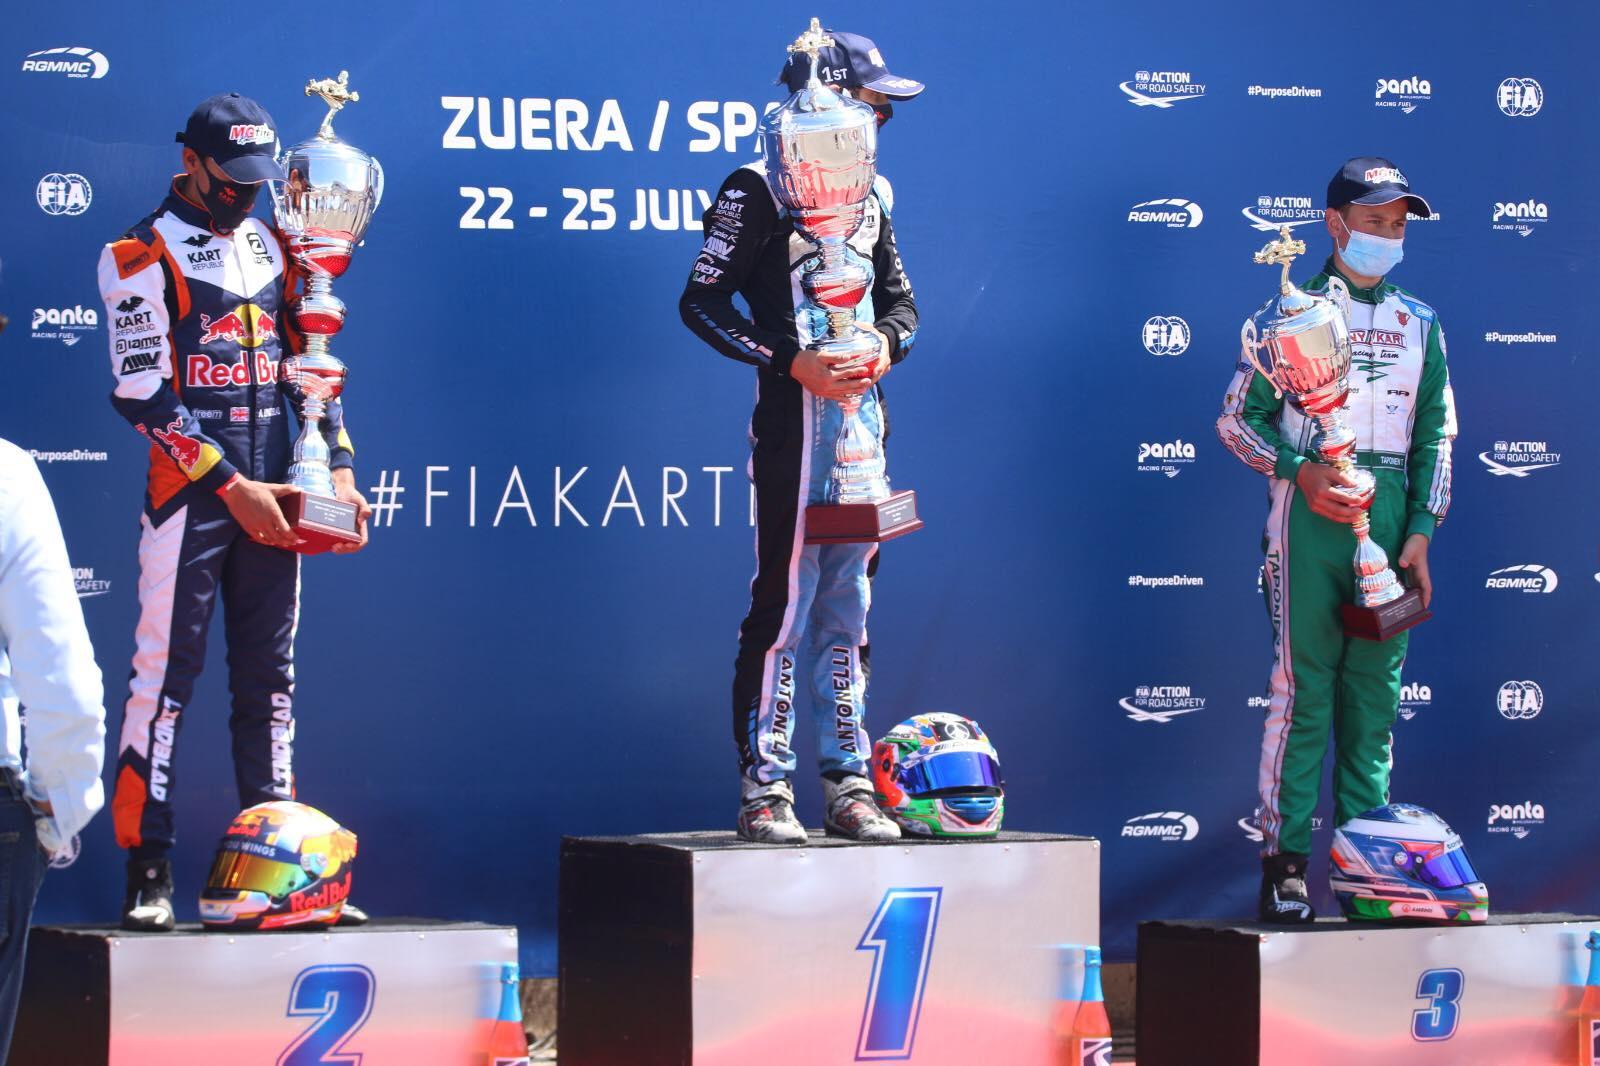 FIA Karting Euro Zuera - Antonelli and Slater, European Champions!